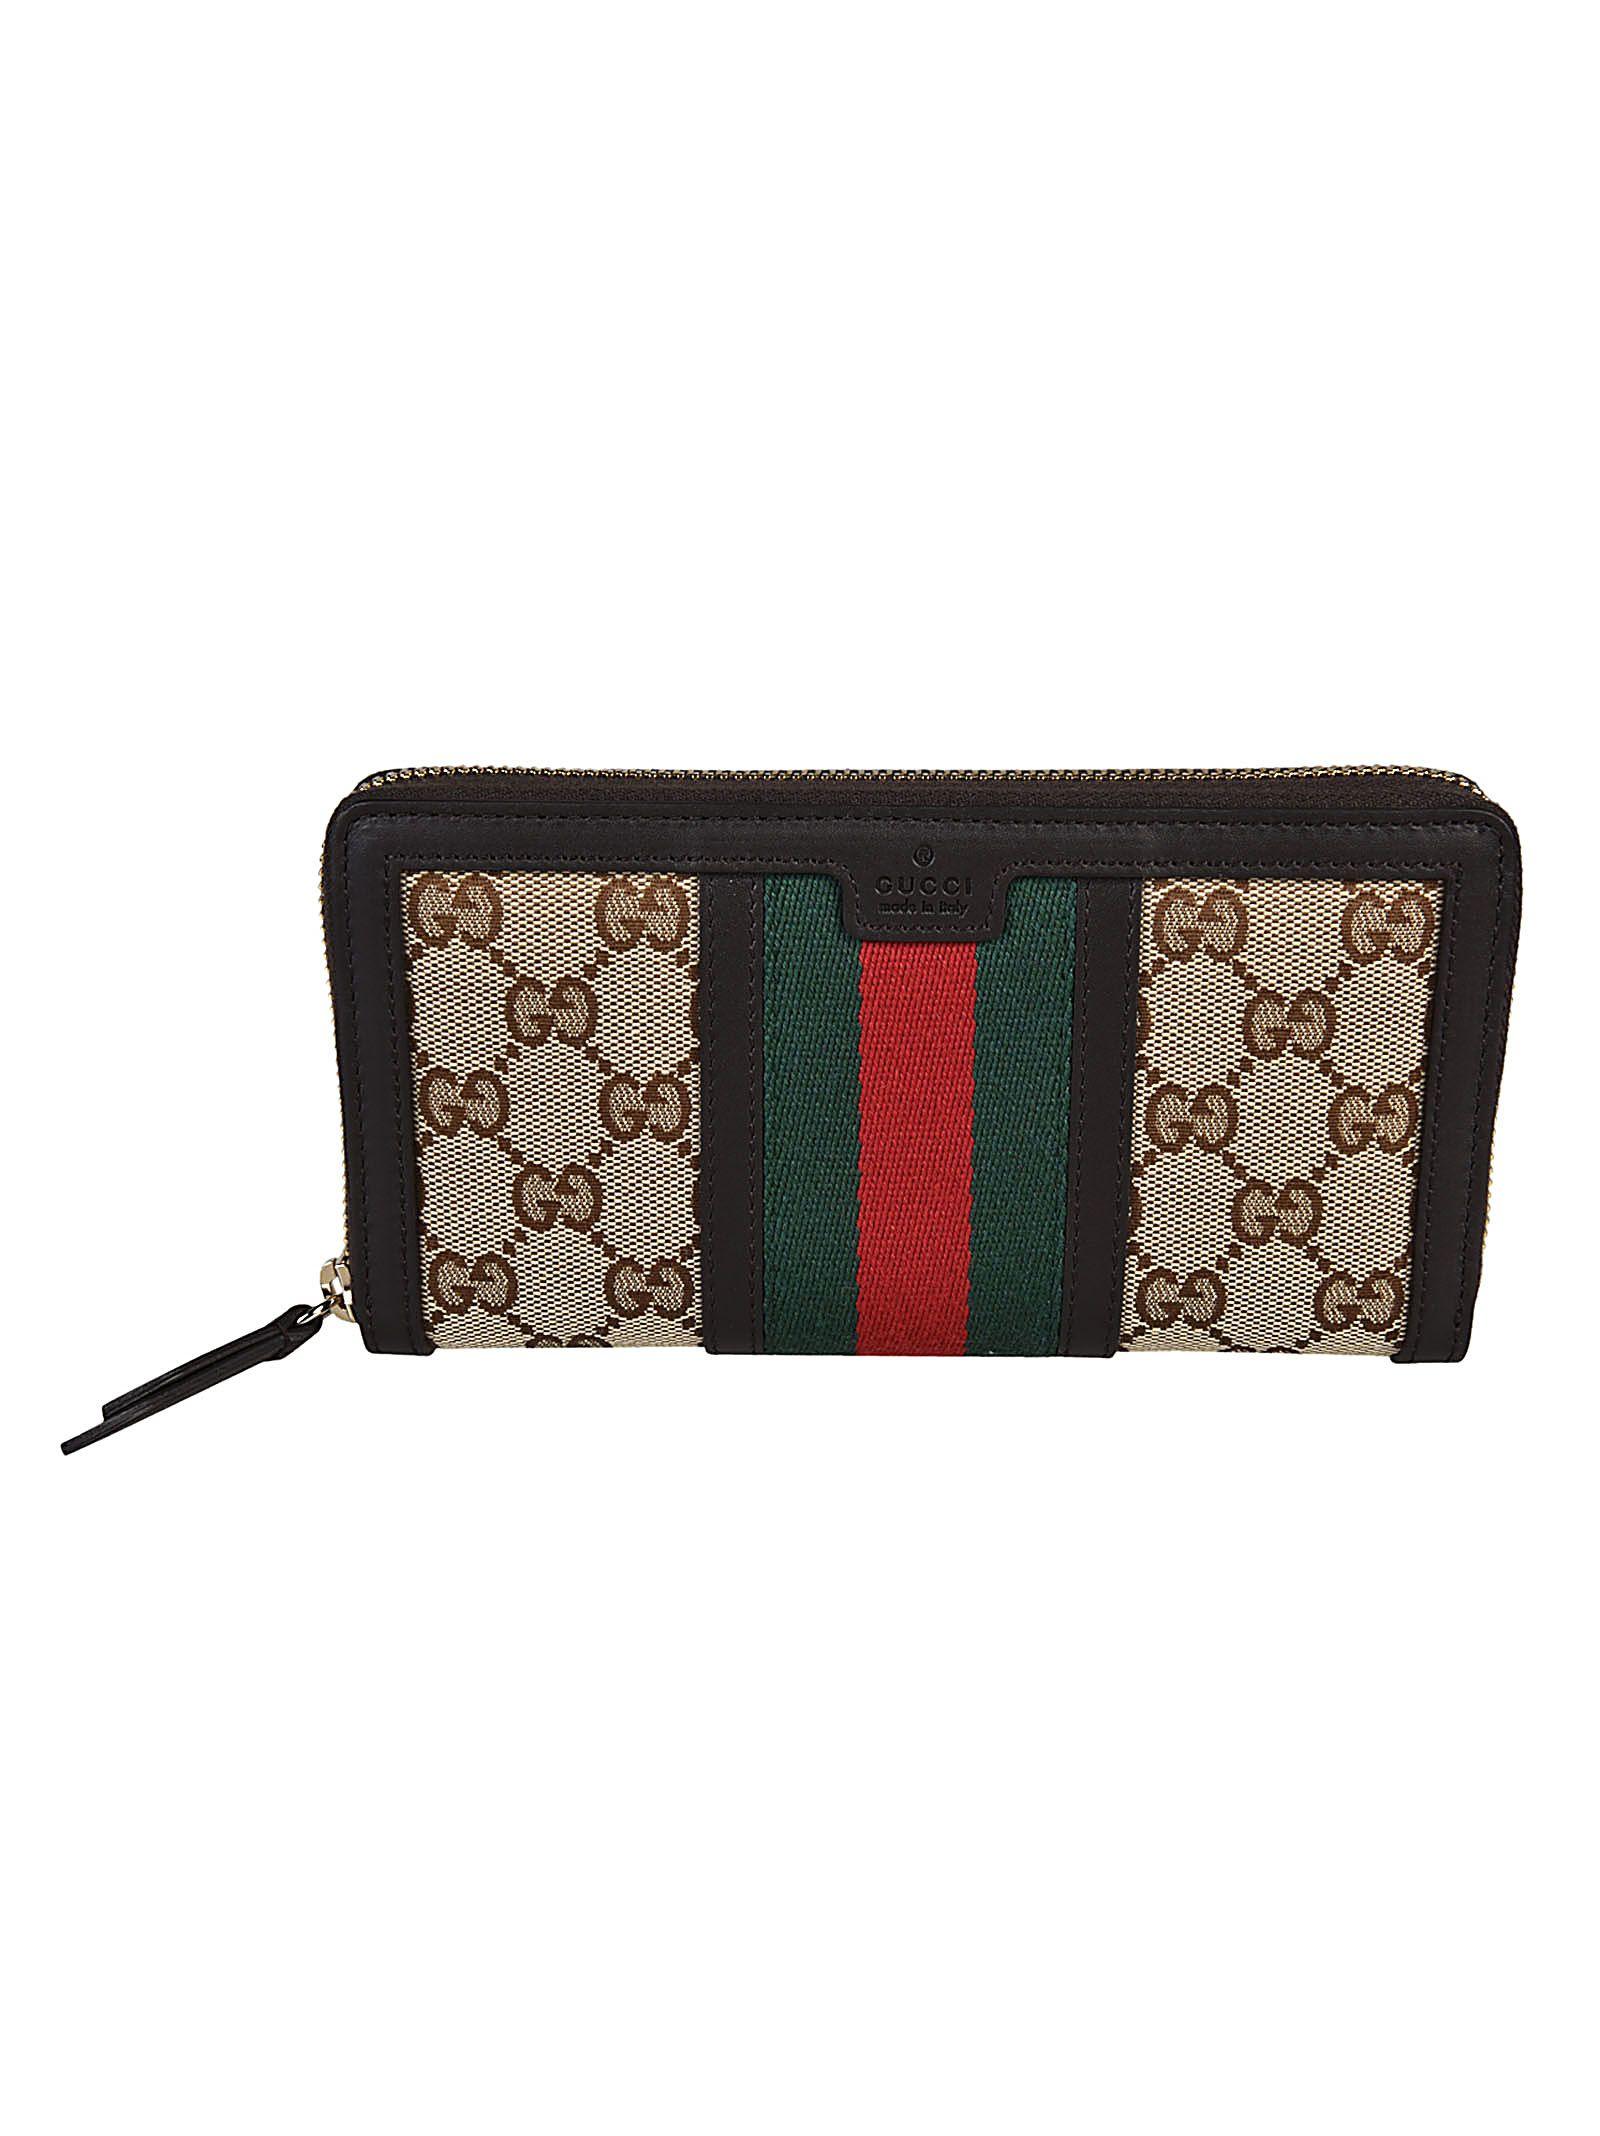 64c5a7e955b0 Gucci Vintage Web GG Canvas Zip Around Wallet - Brown - 10537126 | italist